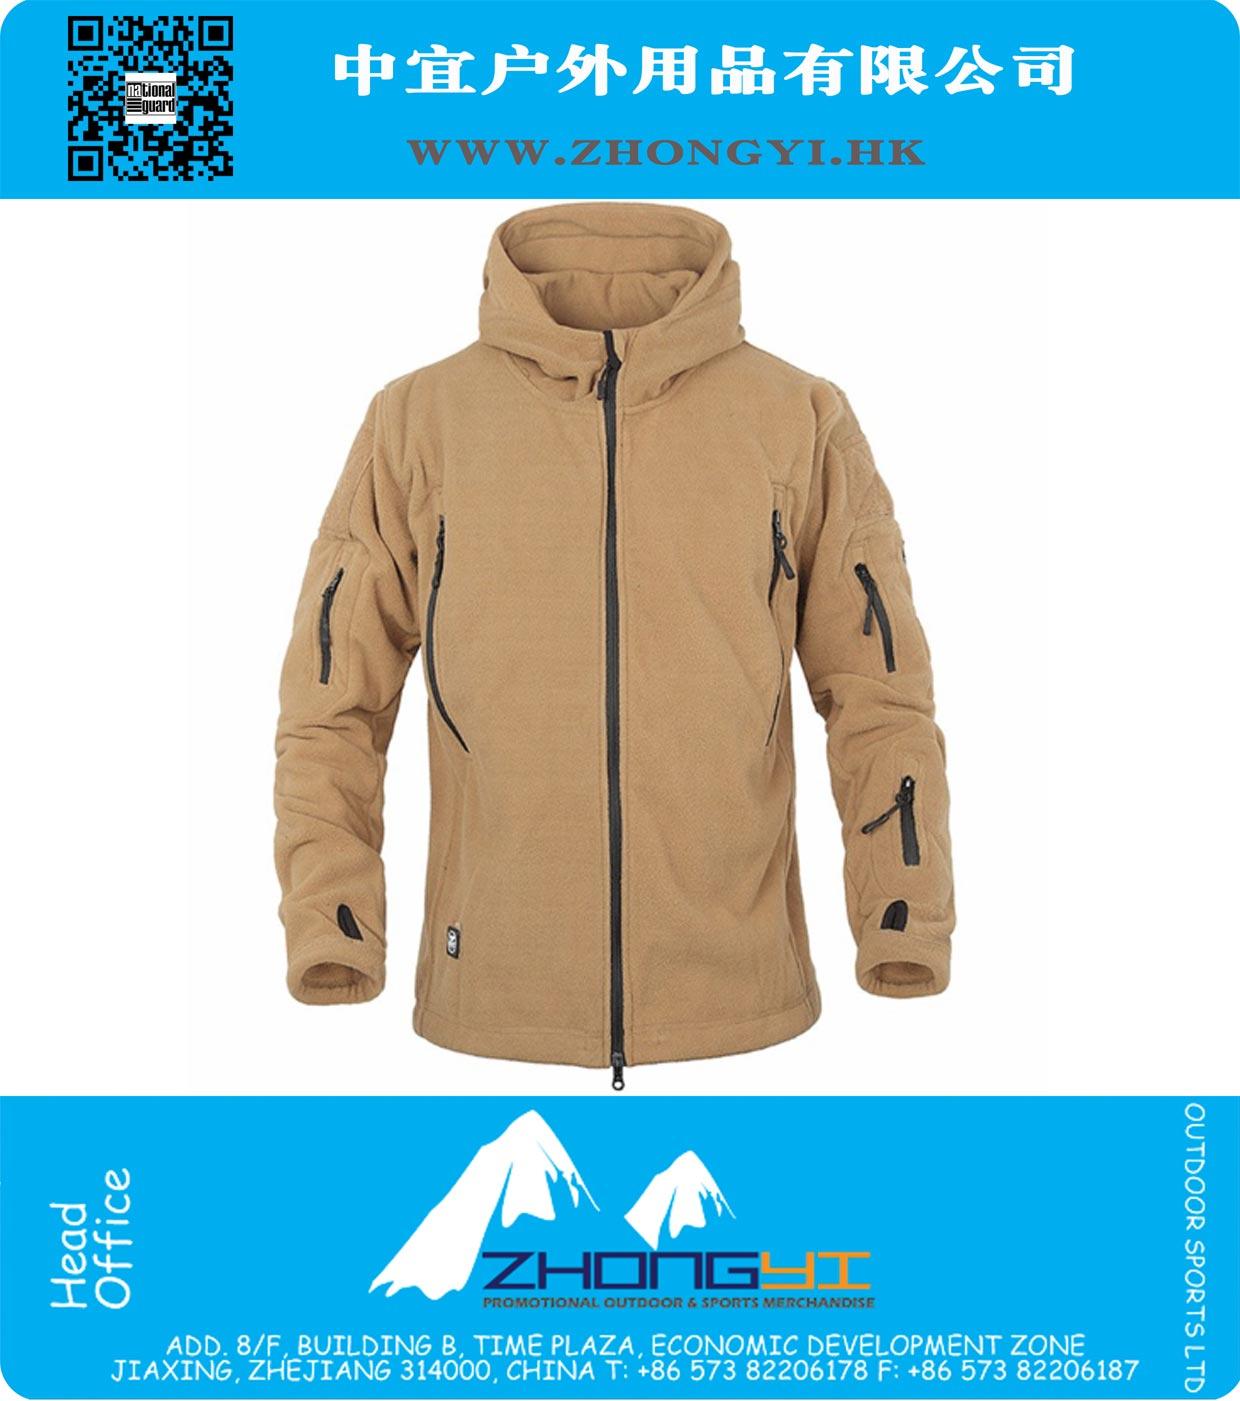 d4f346ad43526 Military Fleece Jacket. Winter Tactical Jacket Military Uniform Outdoor  Soft Shell Fleece Hoody Jacket Men Thermal Hunting Clothing ...